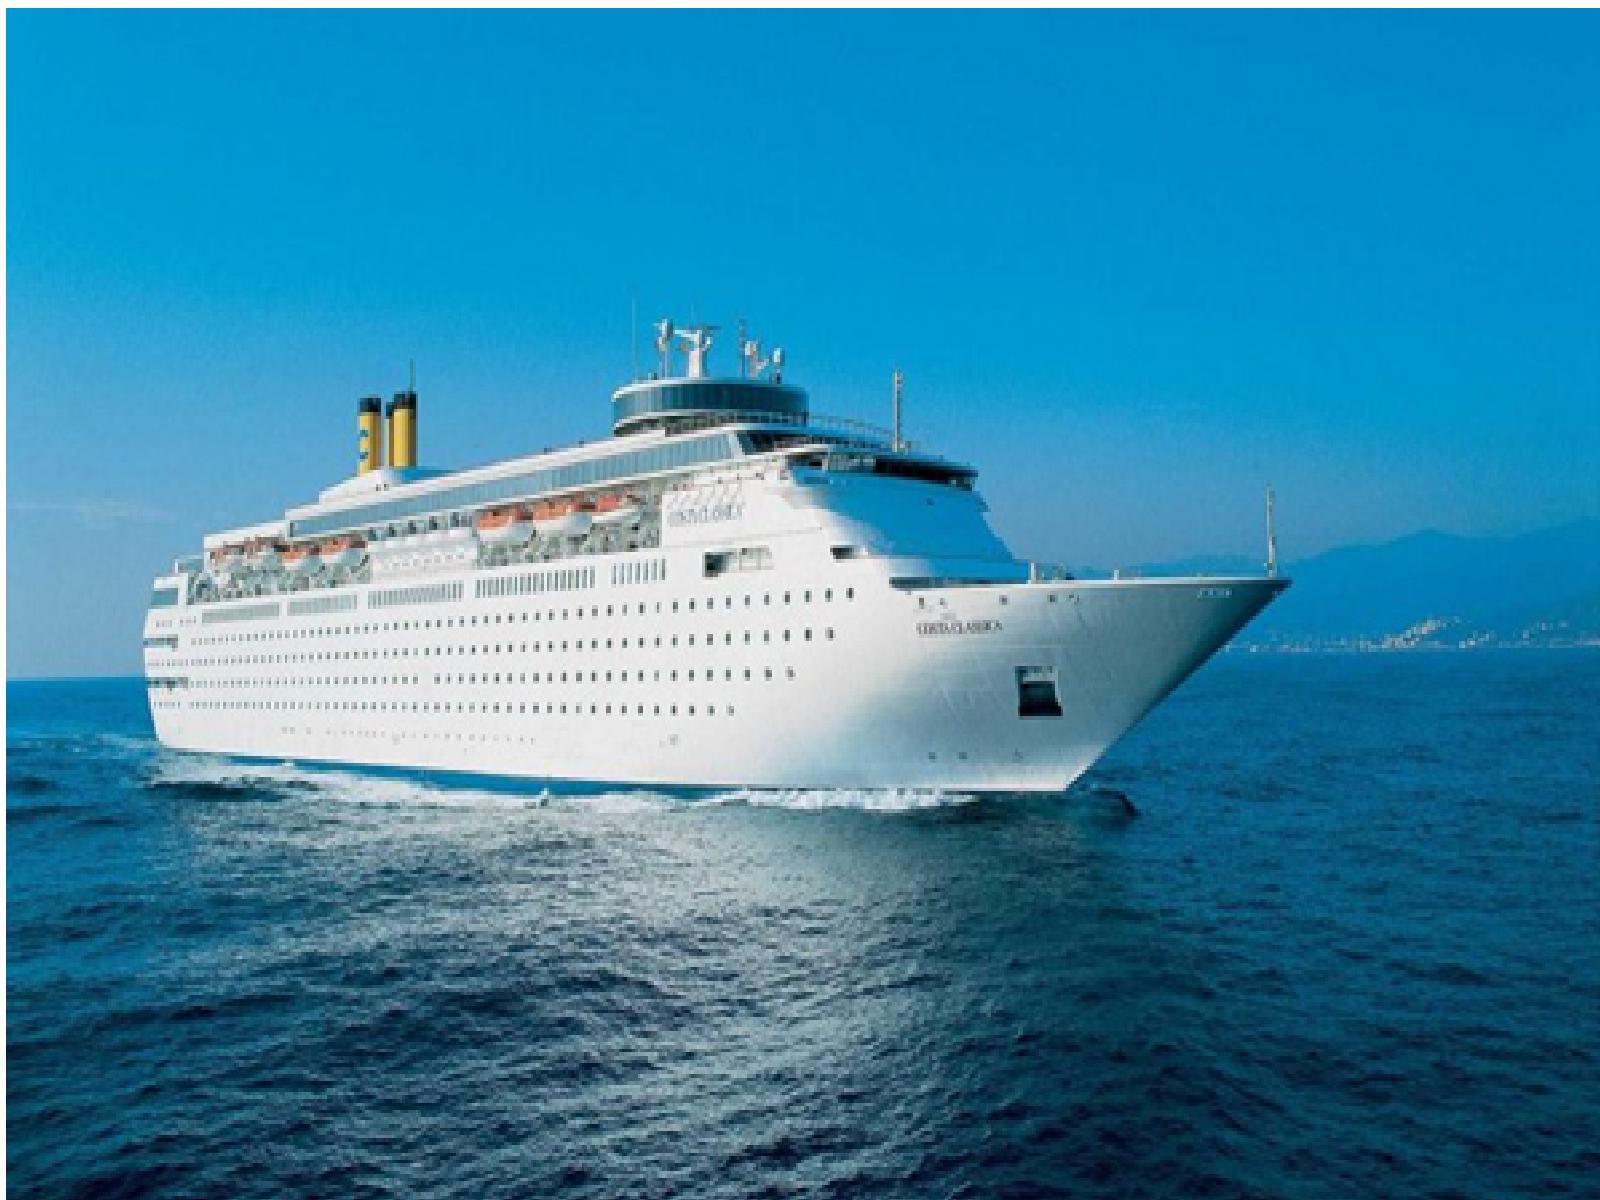 Mumbai to Goa in a cruise